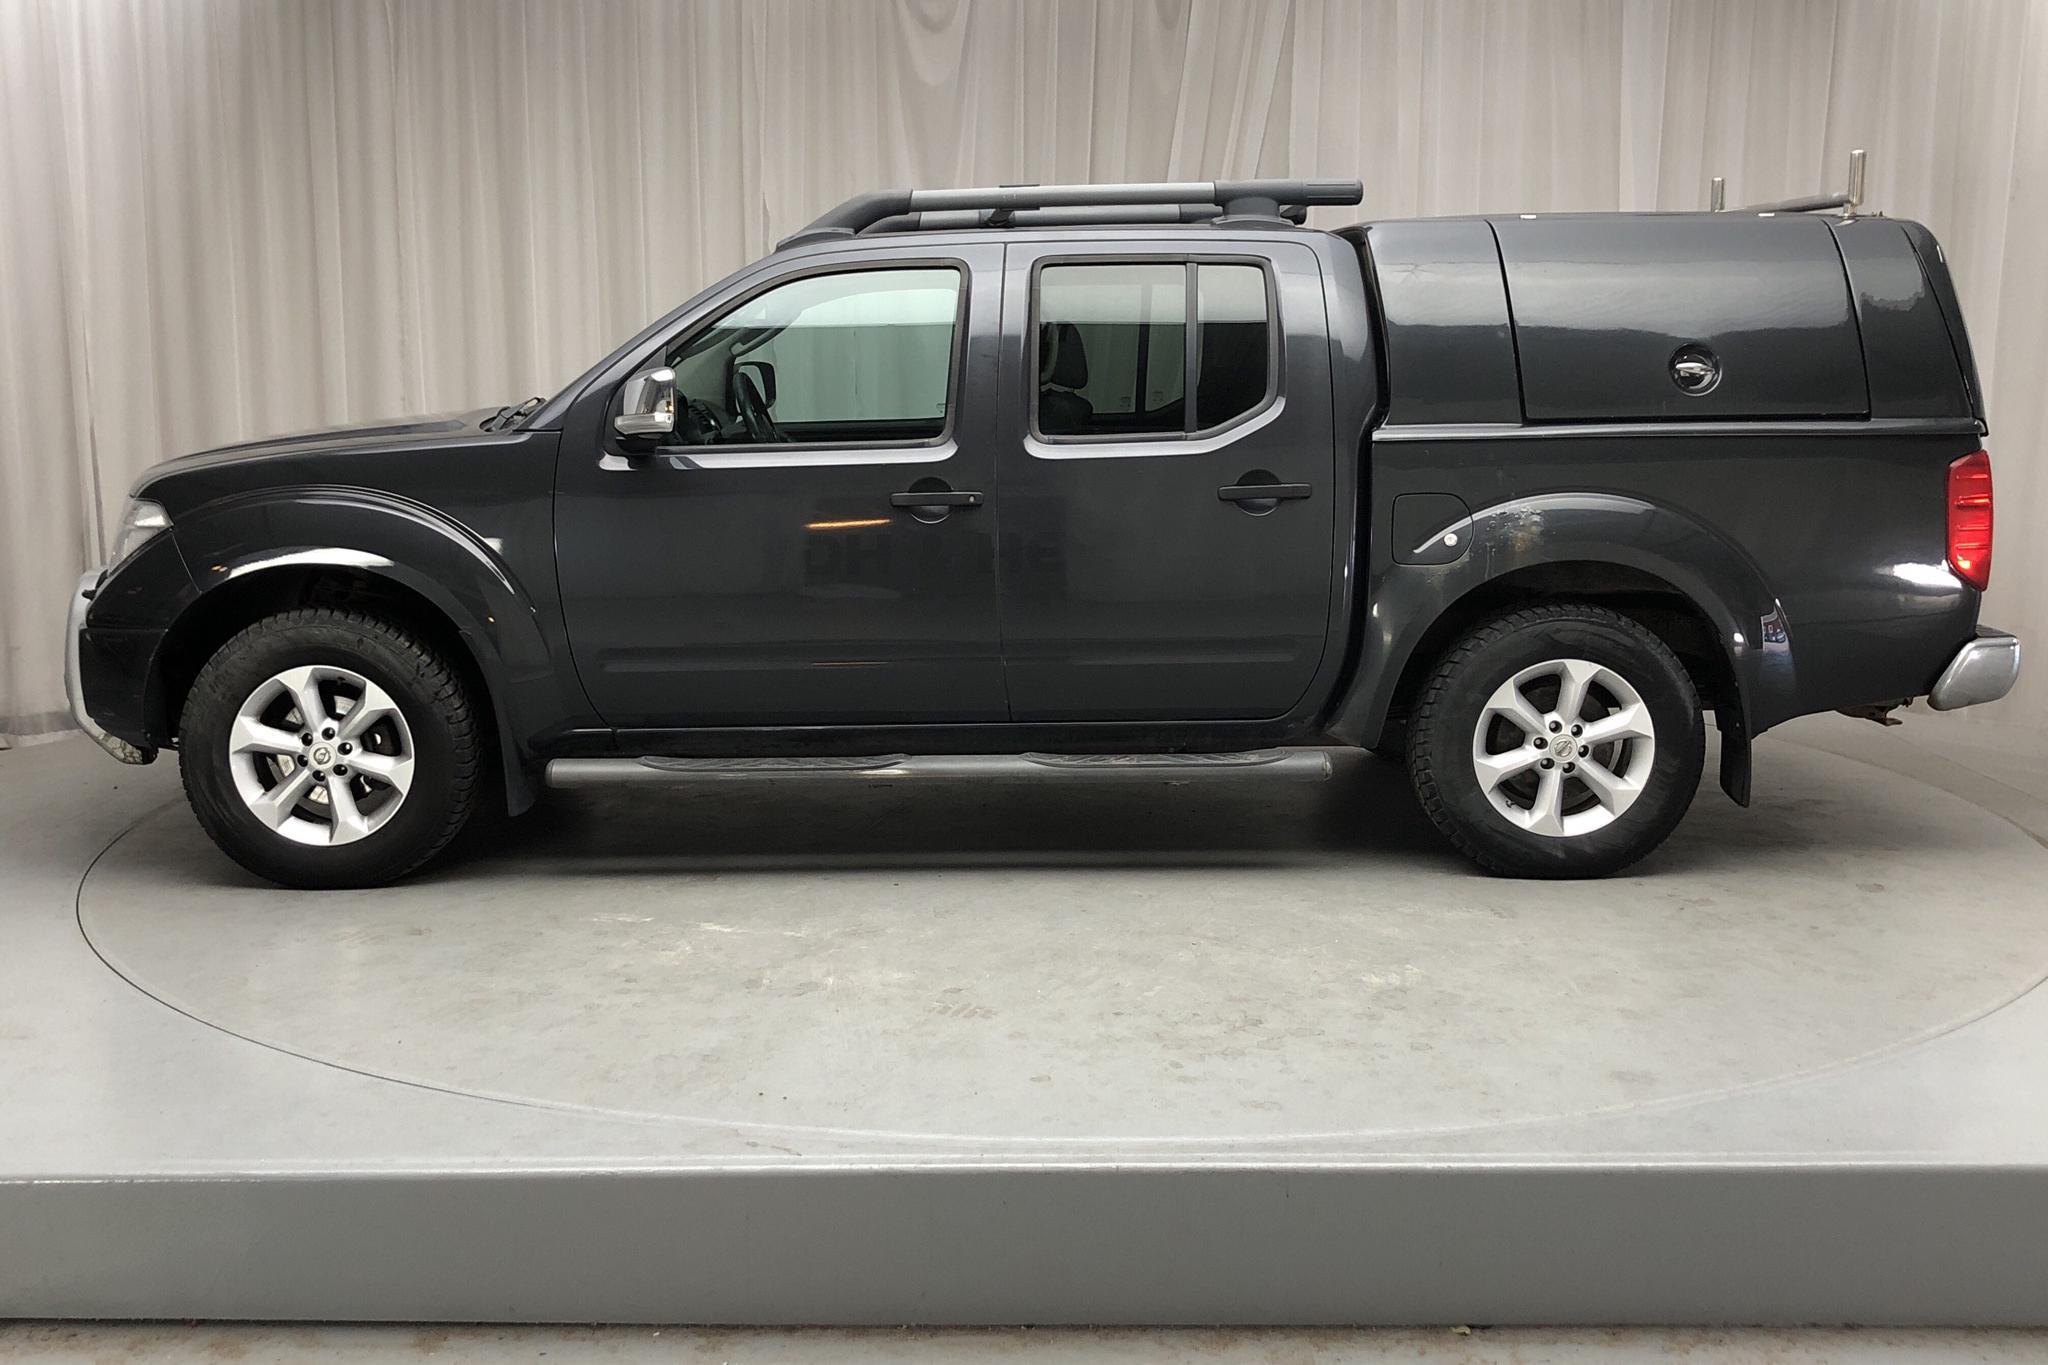 Nissan Navara 2.5 dCi 4WD (171hk) - 20 439 mil - Automat - Dark Grey - 2008